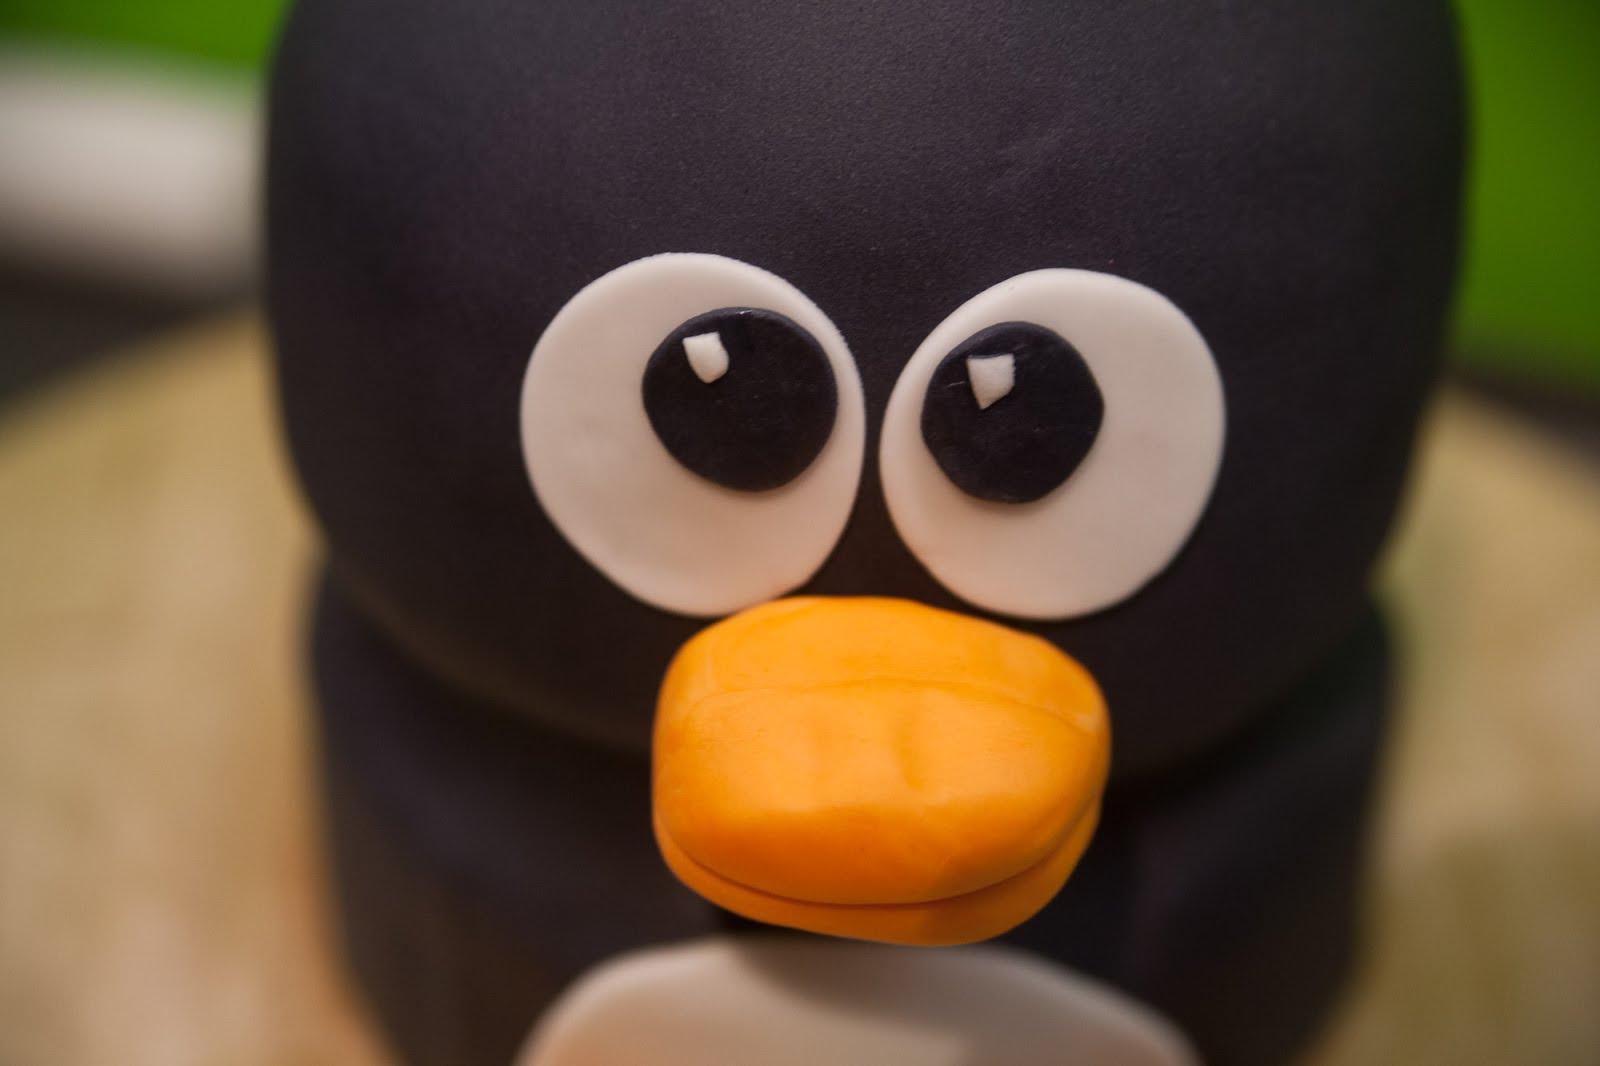 3d torte pinguin mit rezept und anleitung. Black Bedroom Furniture Sets. Home Design Ideas